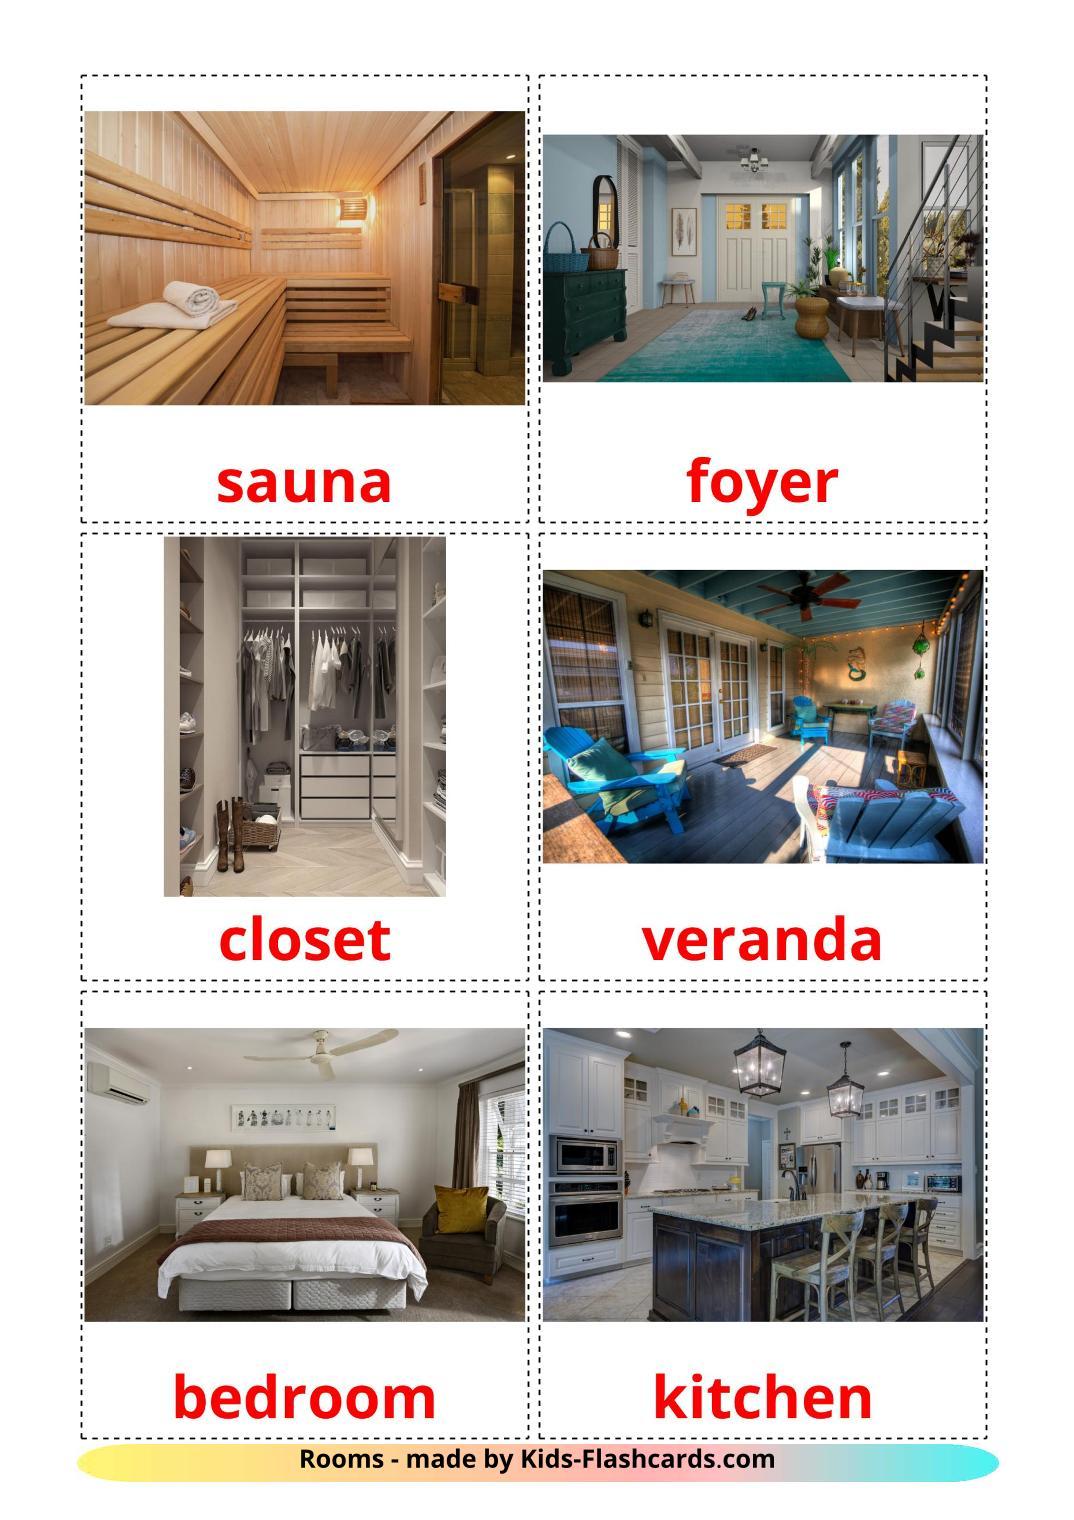 Rooms - 17 Free Printable english Flashcards